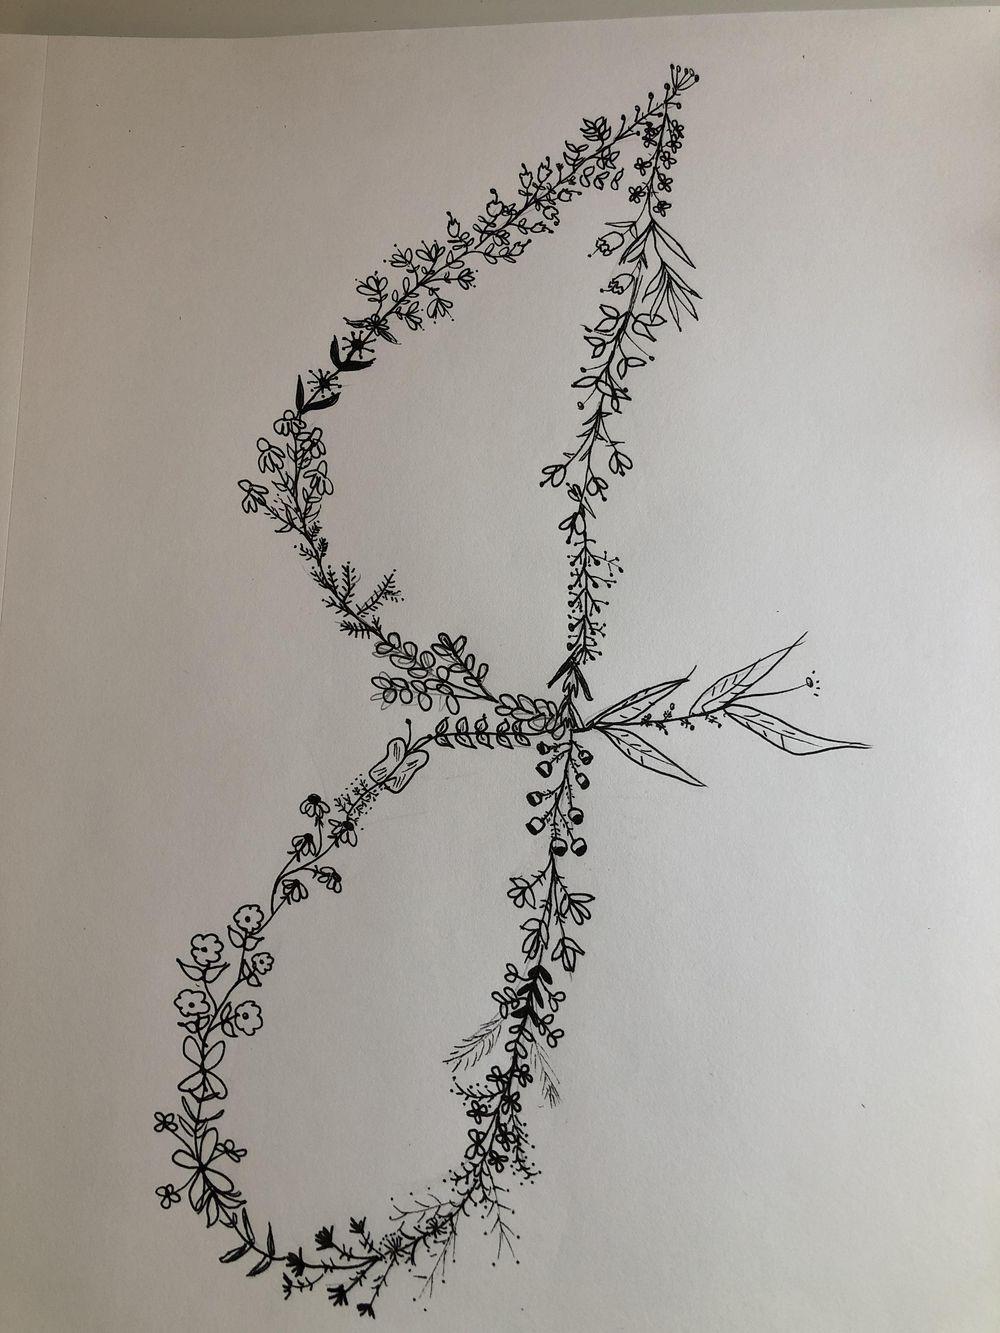 Letter floral doodle - image 1 - student project